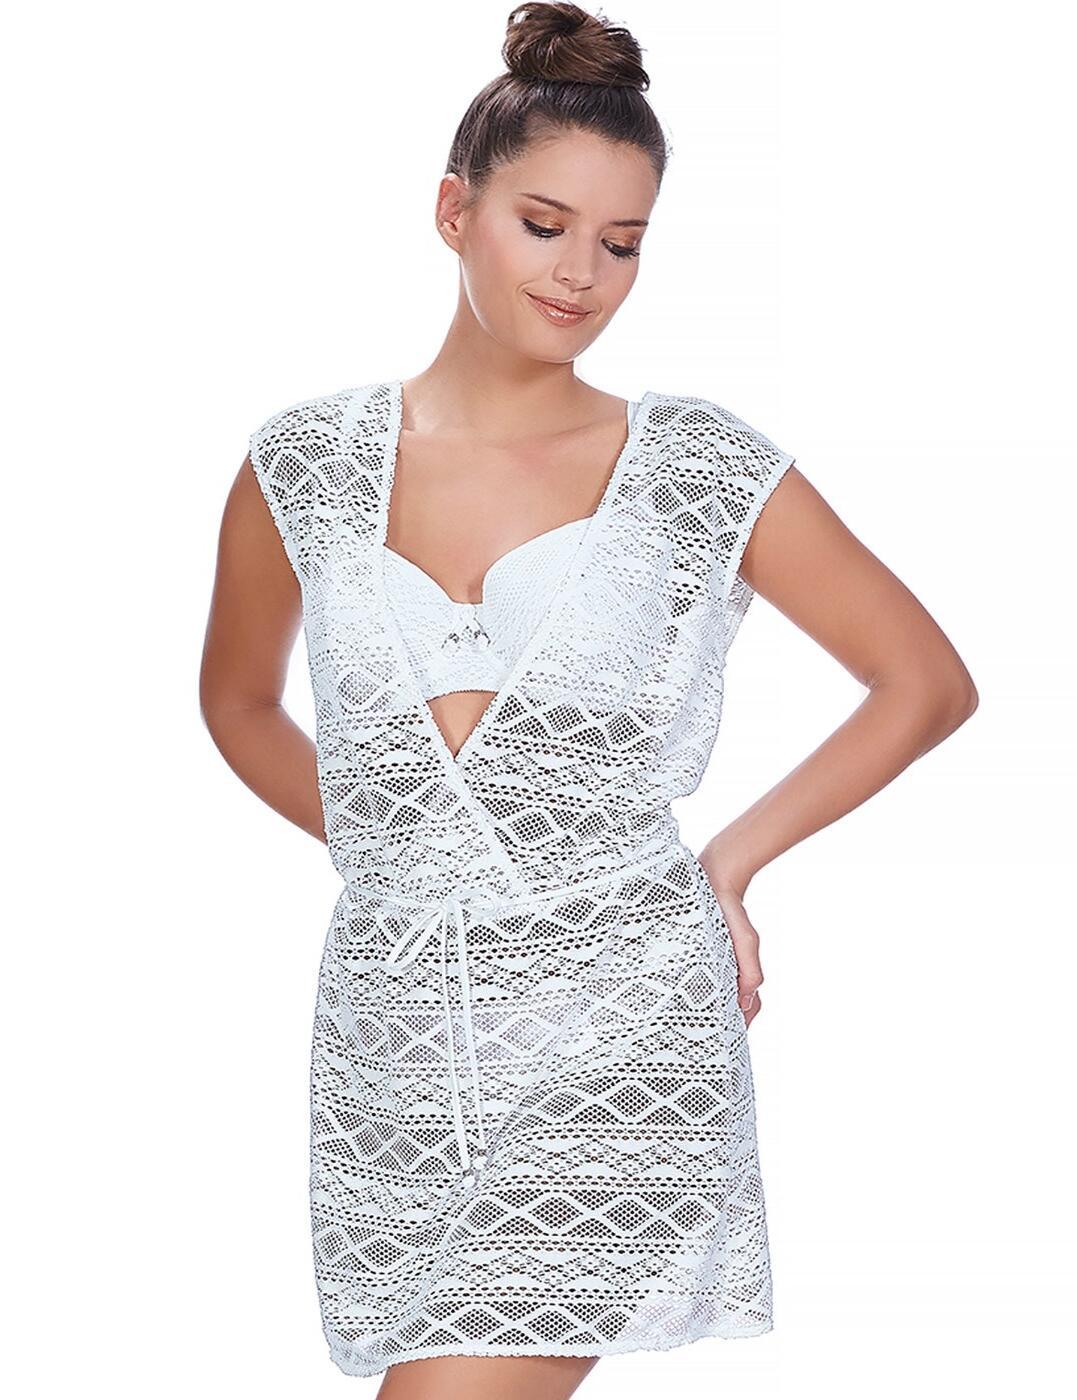 3978 Freya Sundance Cross Over Beach Dress - 3978 White